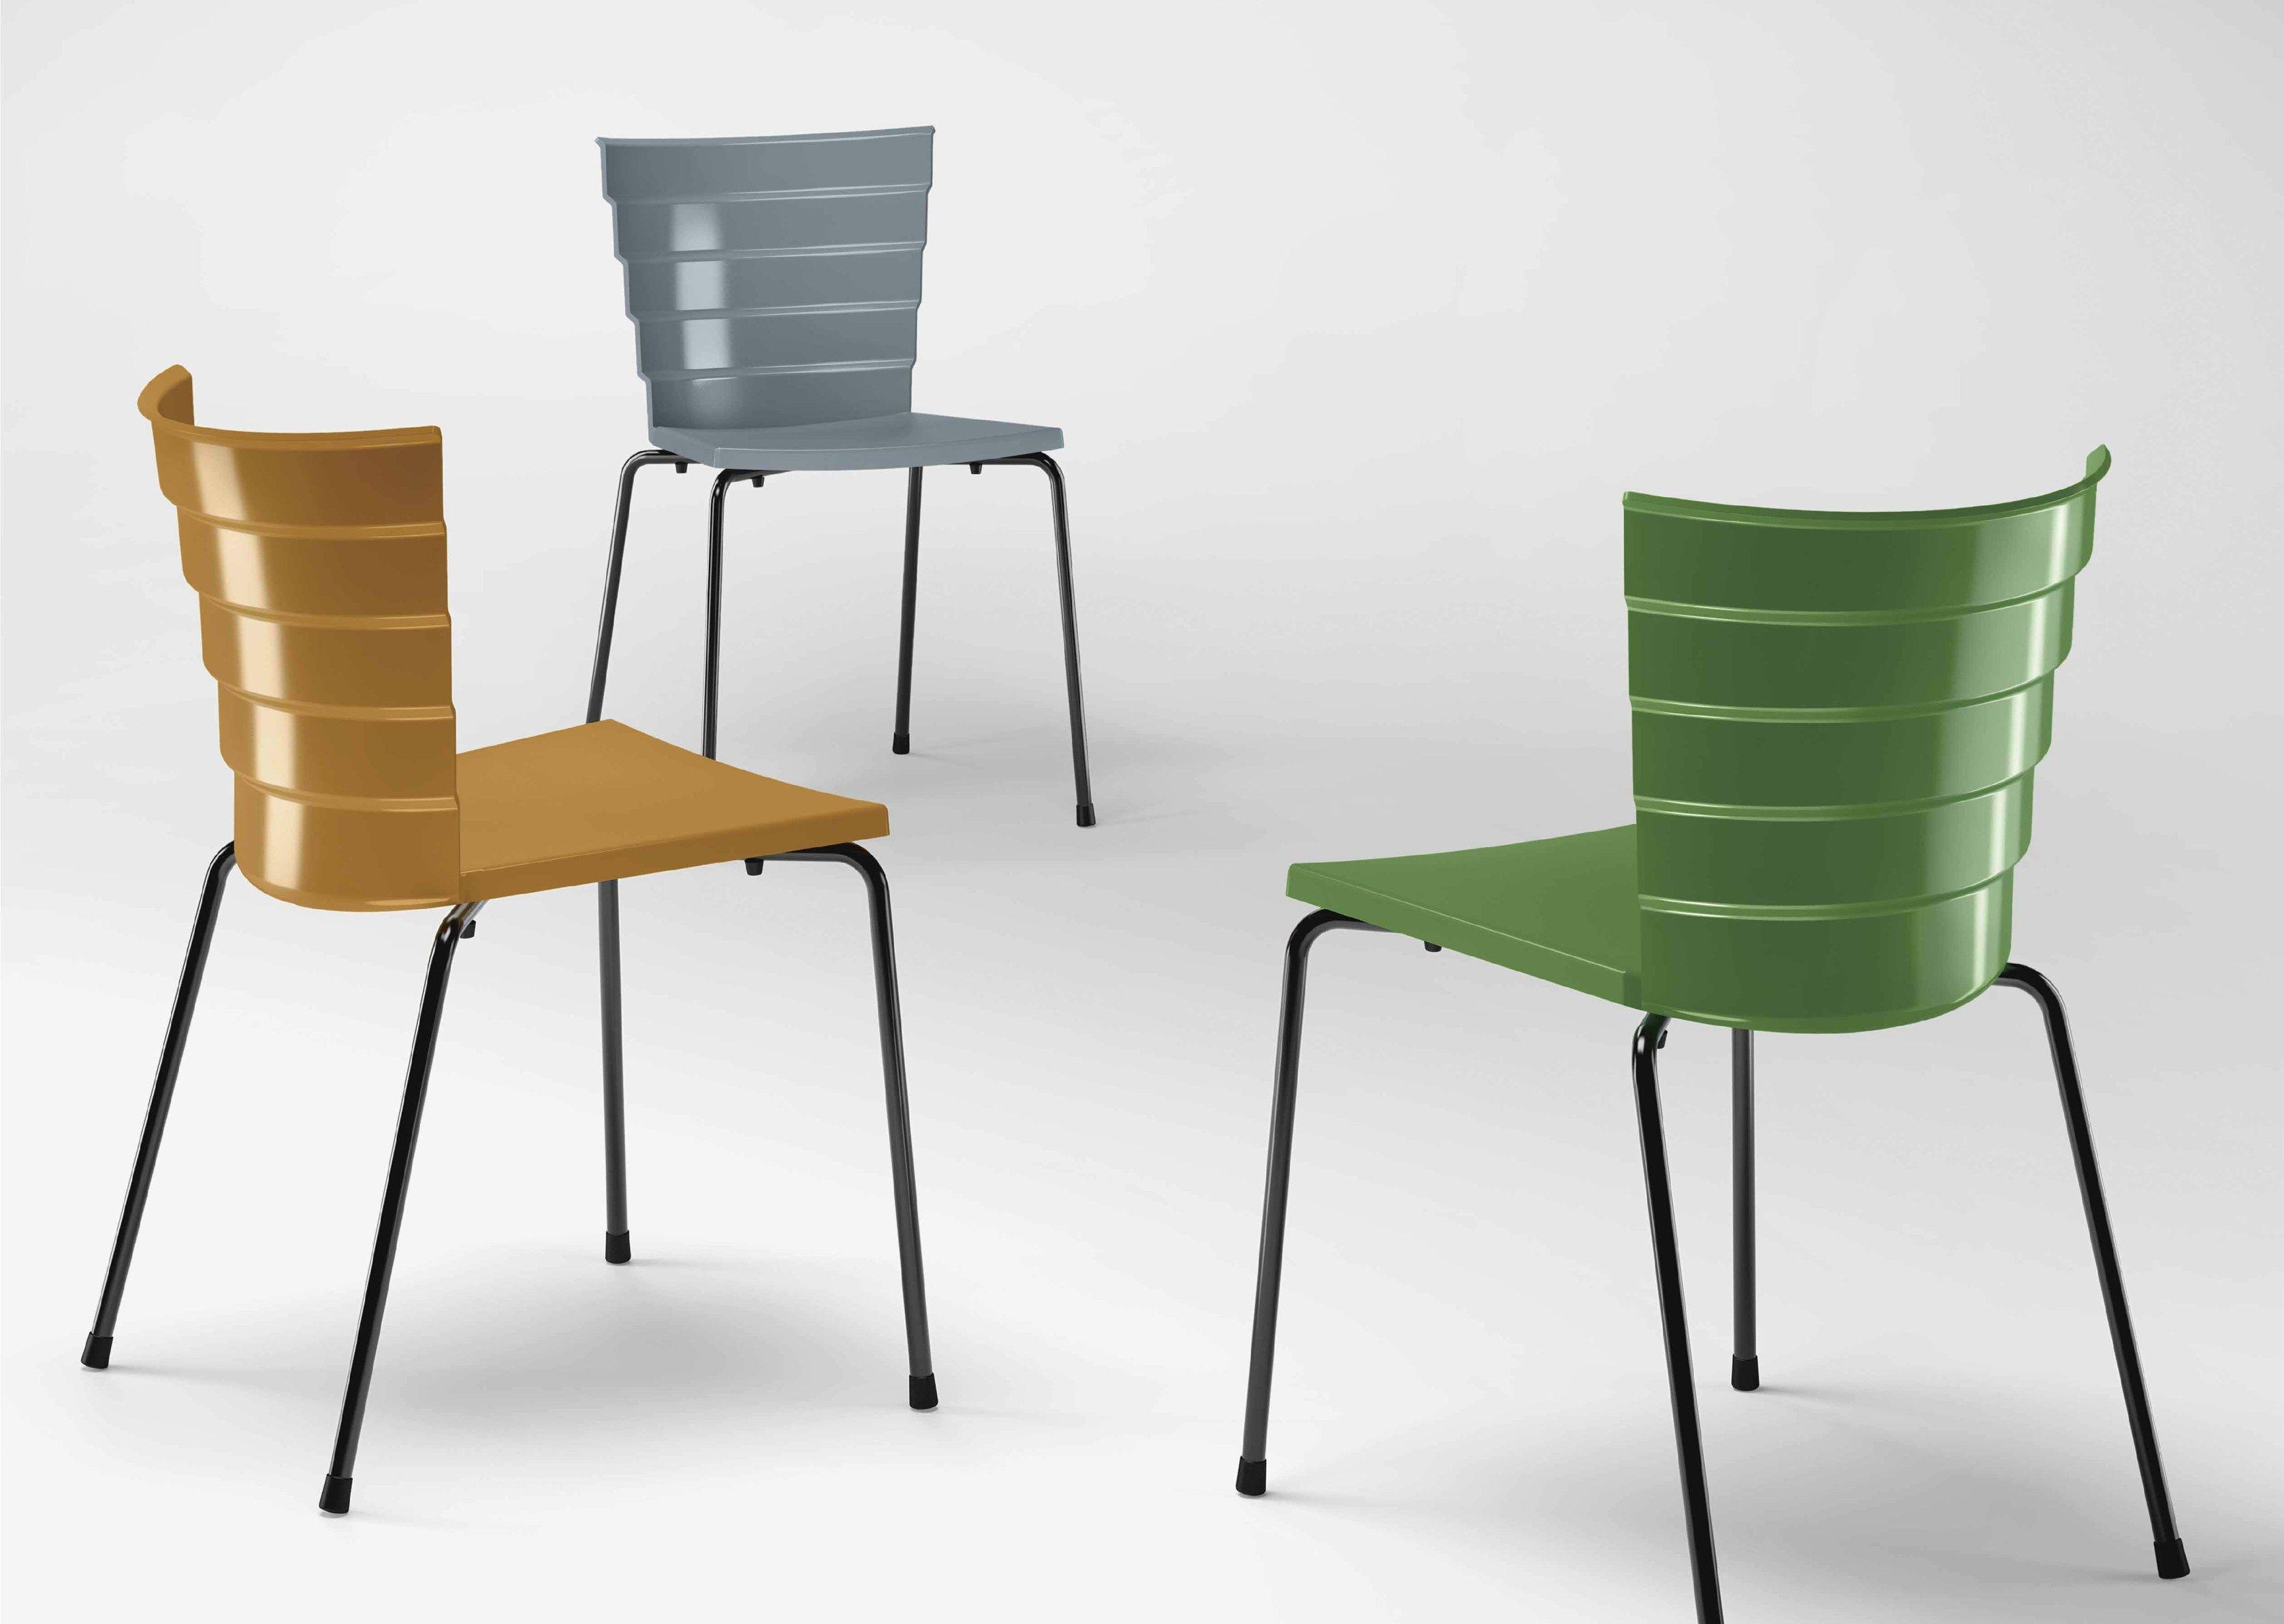 Metalmobil Sedie ~ Collezione sedie design marè metalmobil metalmobil